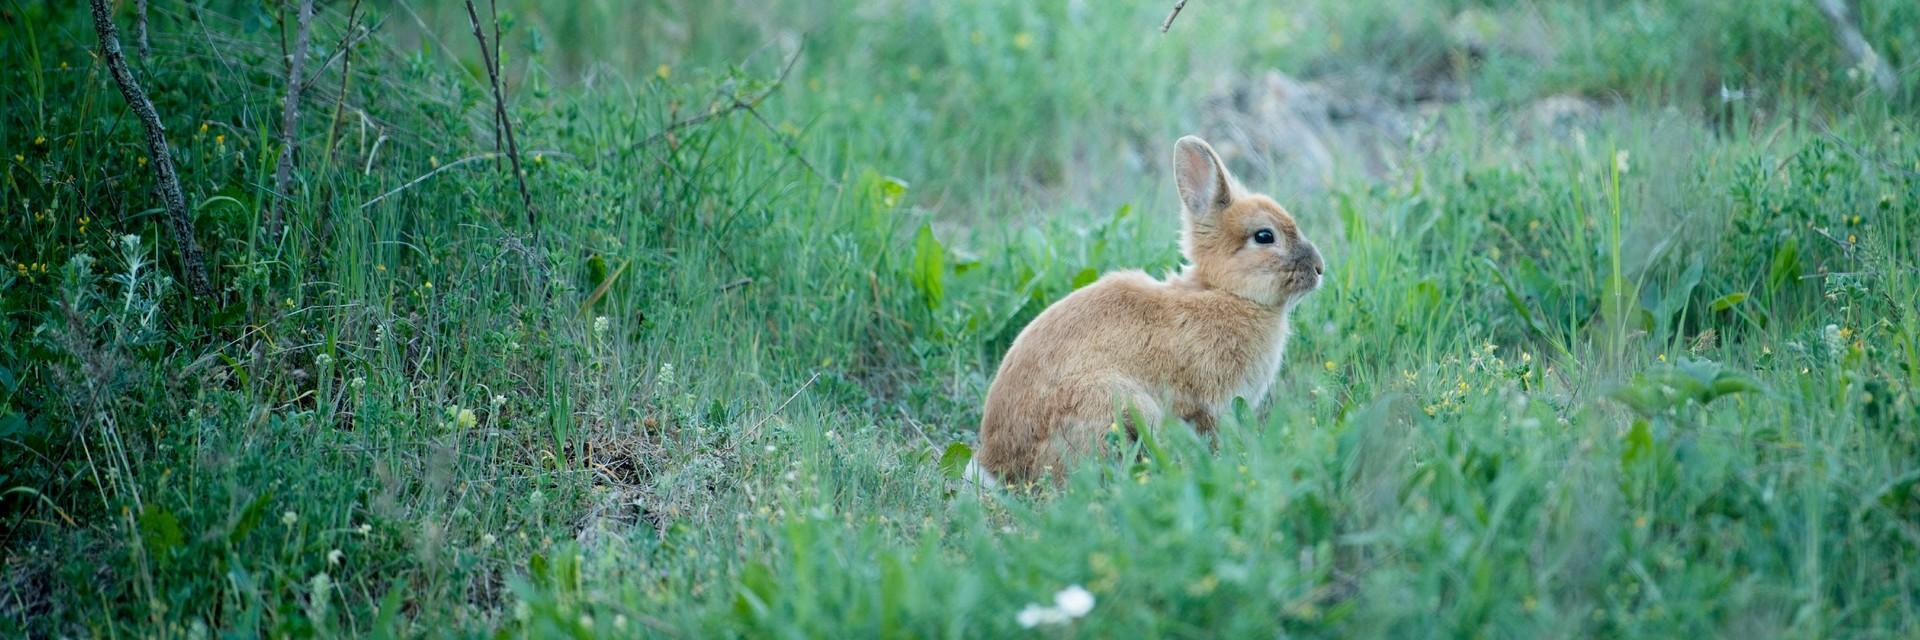 Wild rabbit at BEAR SANCTUARY Prishtina.